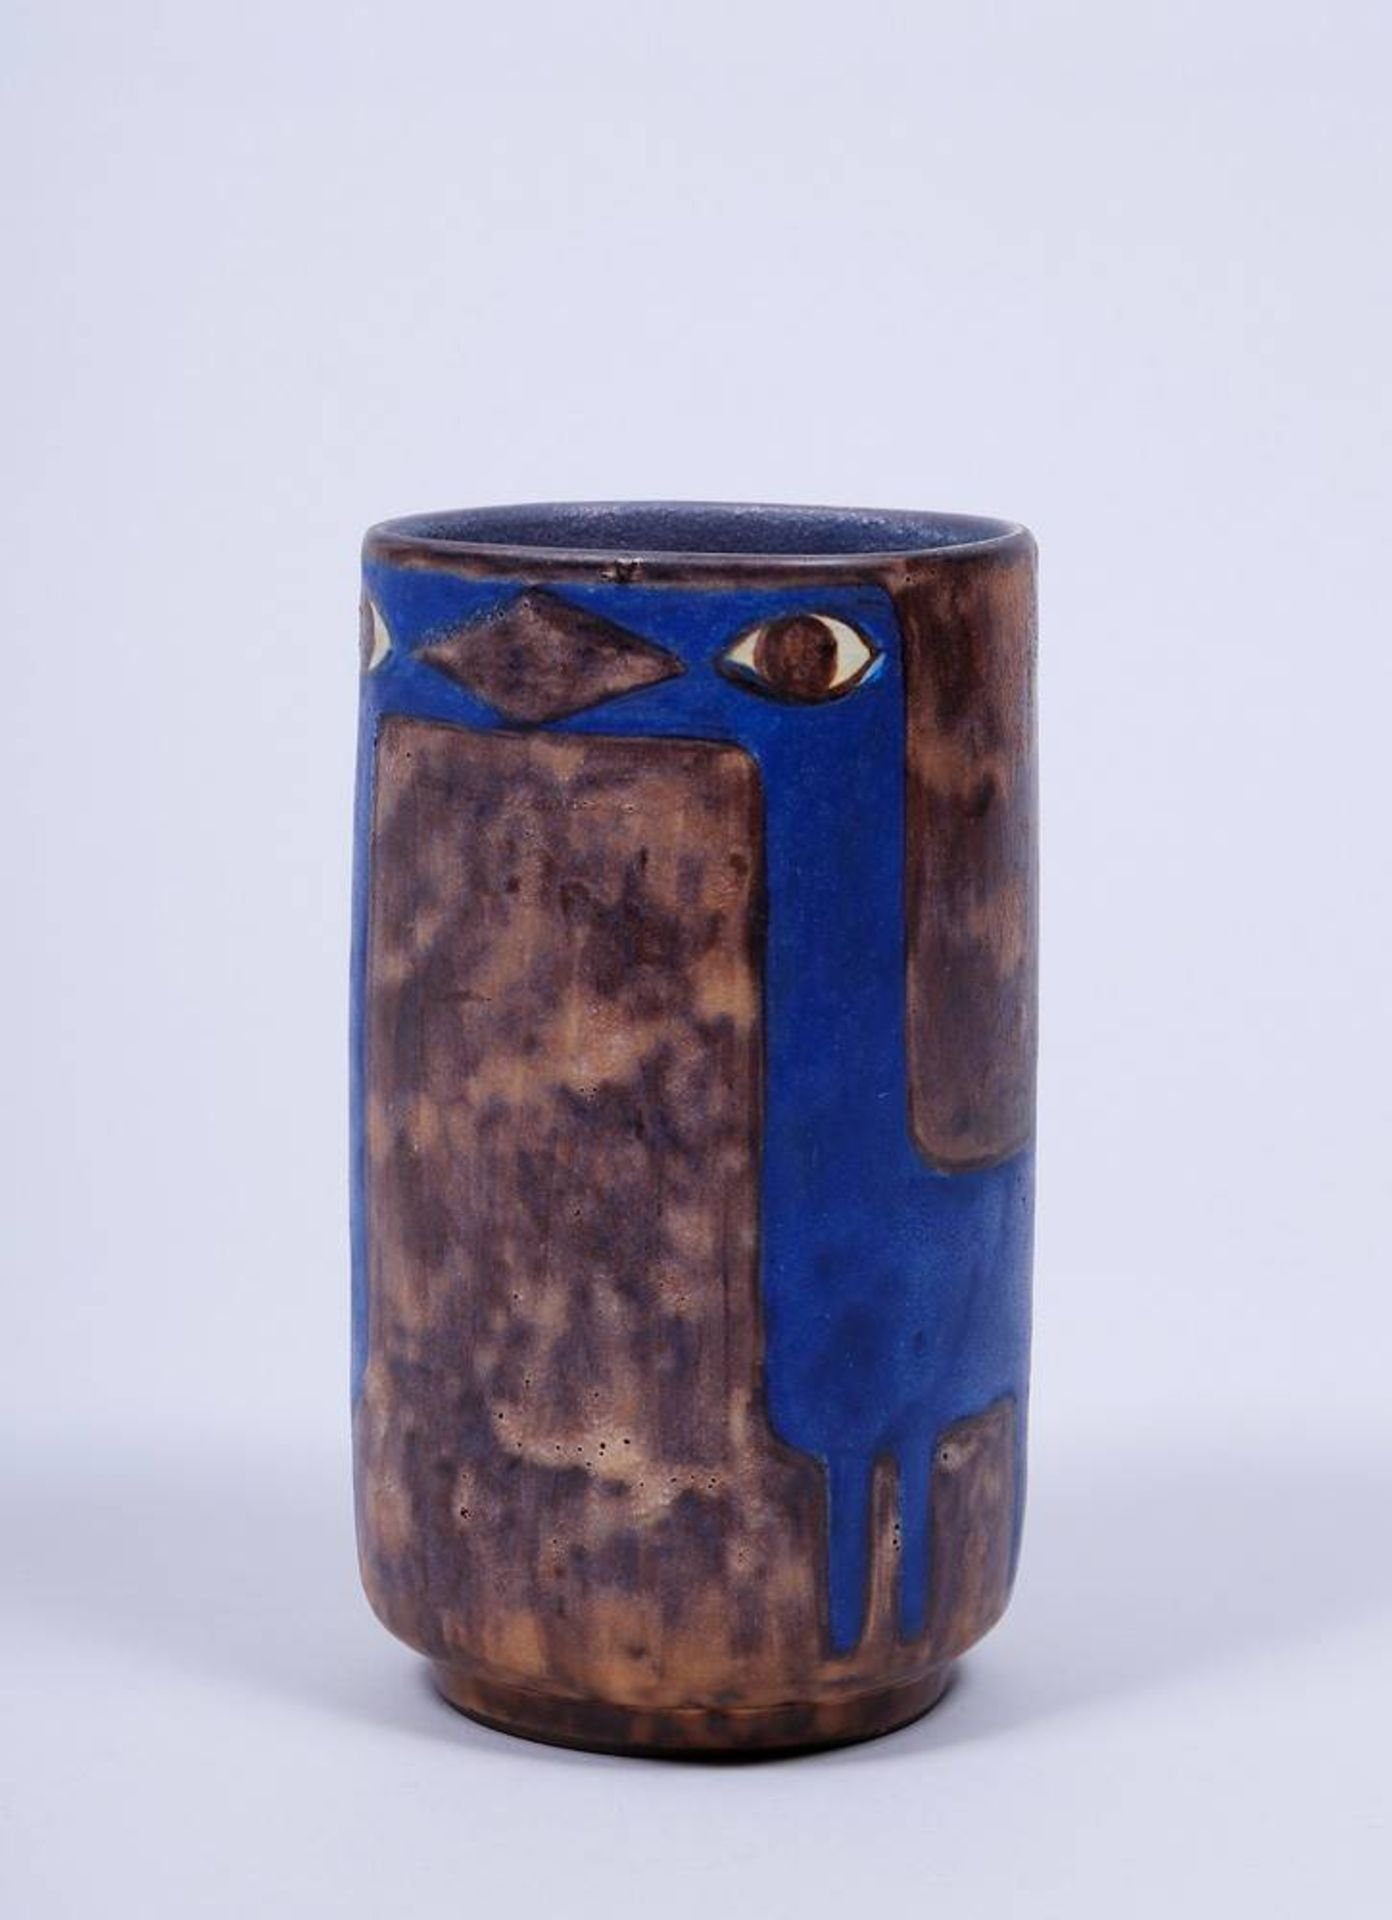 Vase, Entwurf Eva Fritz-Lindner (1933-2017) für Staatliche Majolika Manufaktur Karlsruhe, um 1970